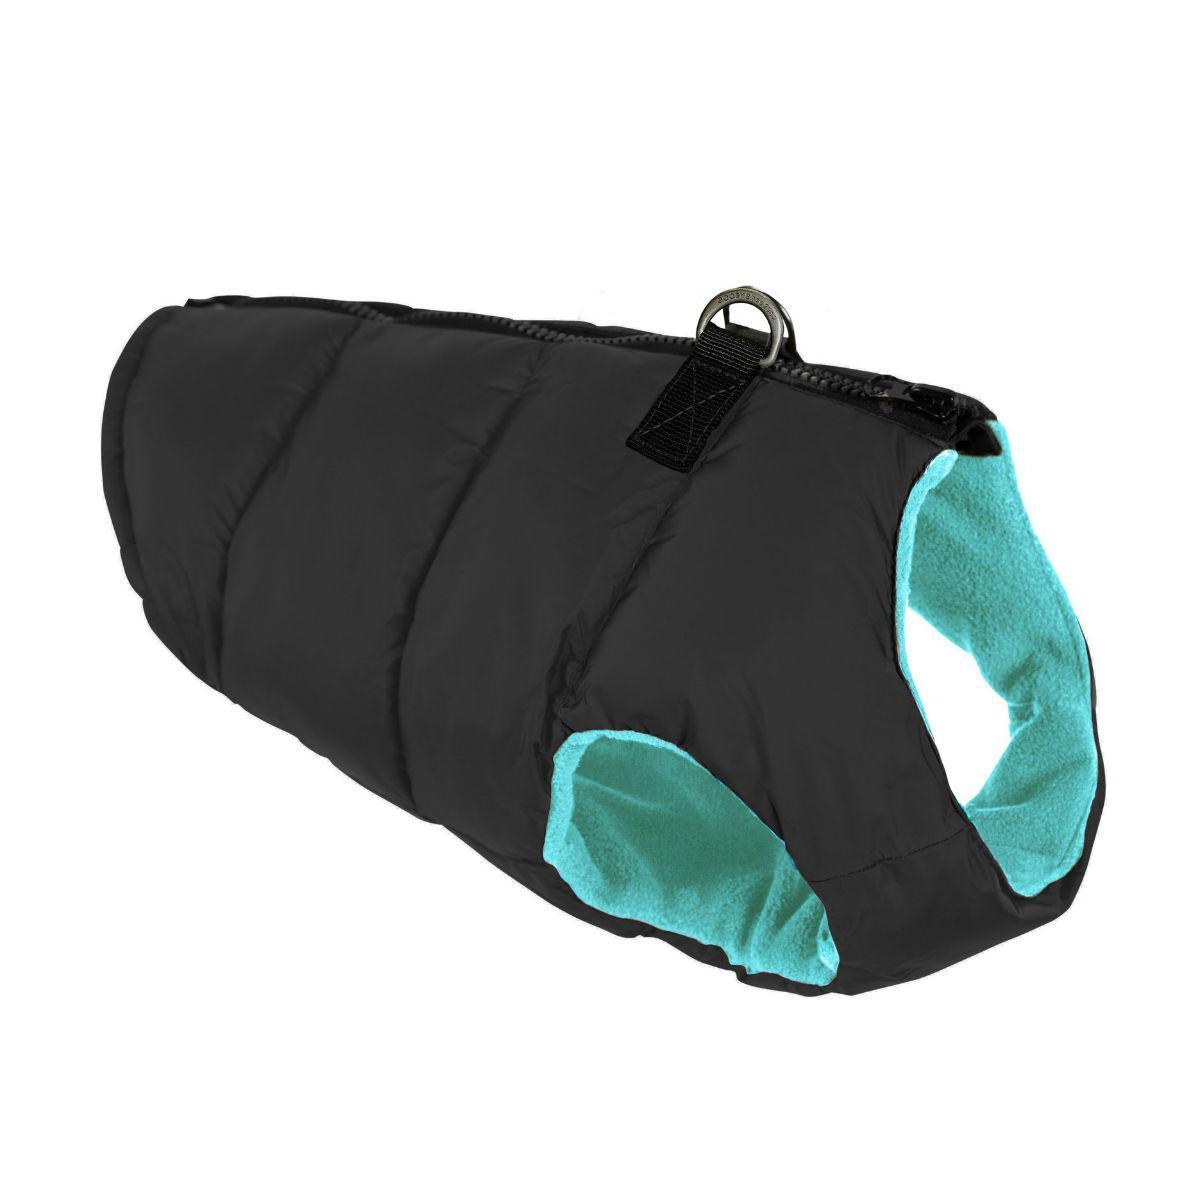 Gooby Padded Dog Vest - Black